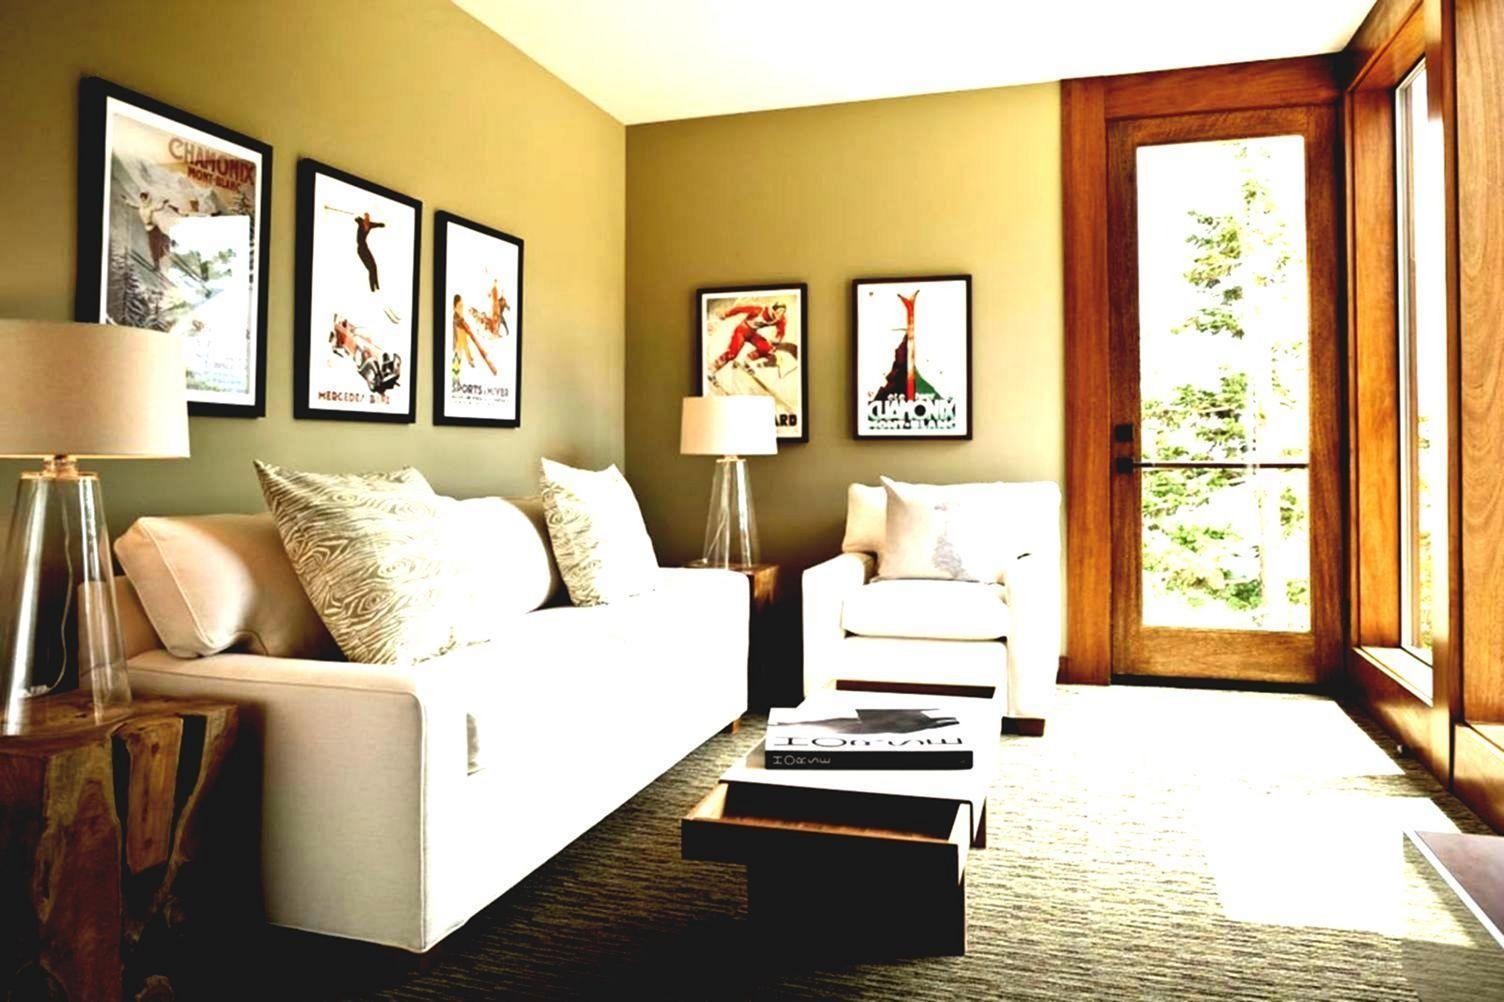 25 Interesting Small Home Decor Ideas You Must Have Design Decorating Small Space Interior Design Living Room Designs India Small Living Rooms Small home design ideas living room